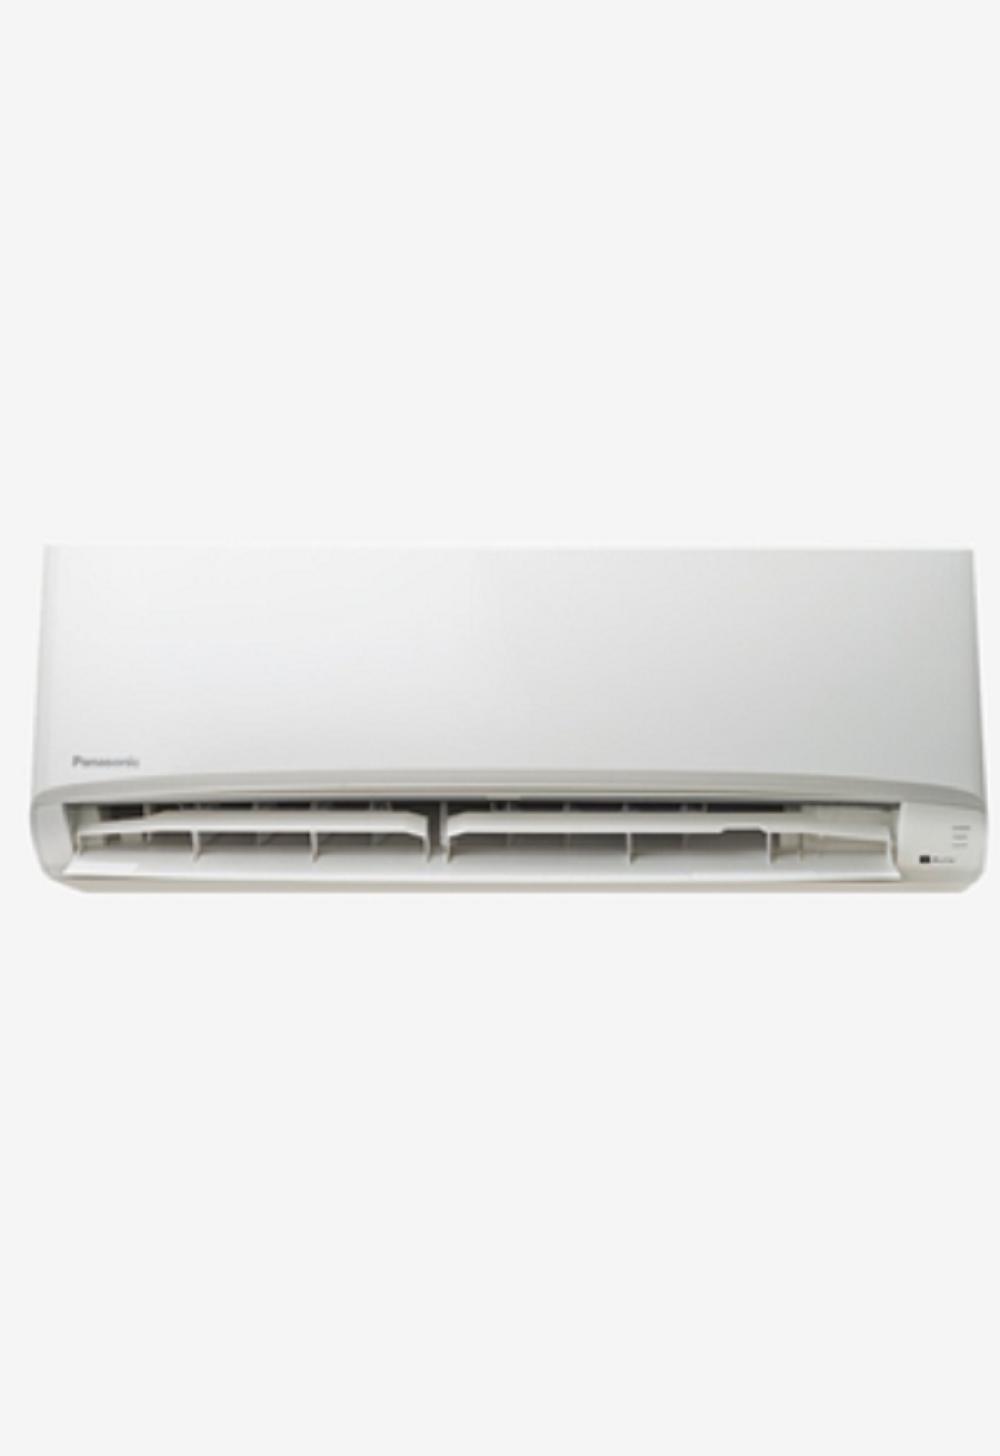 Panasonic AC Split 1,5pk CS-YN12TKJ Termasuk Pasang